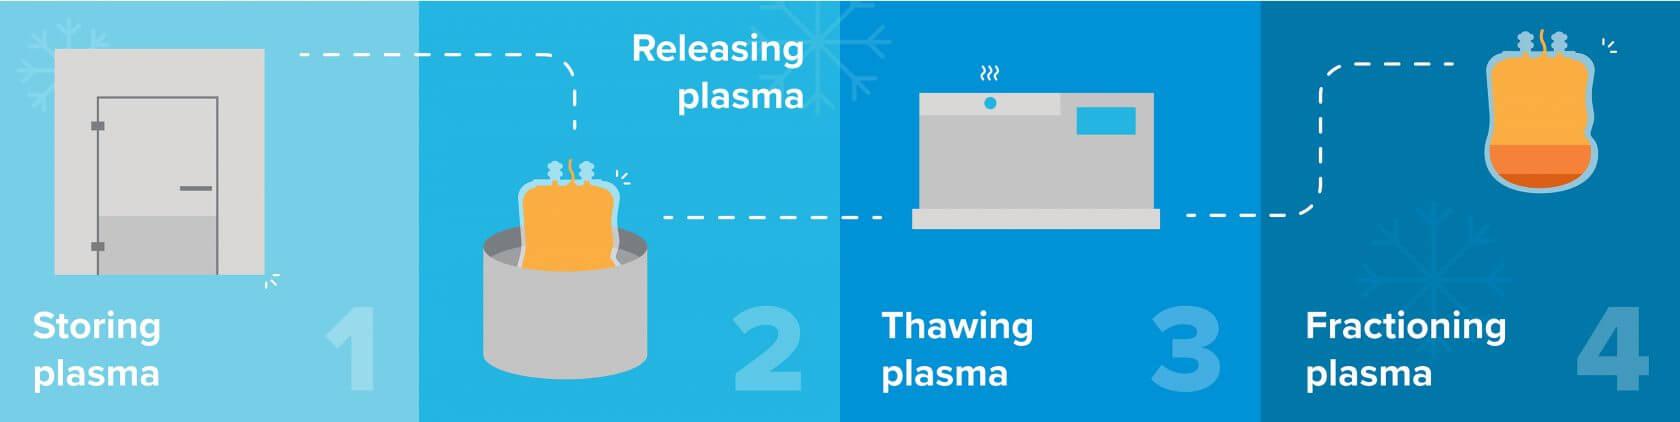 4 steps in plasma fractionation process